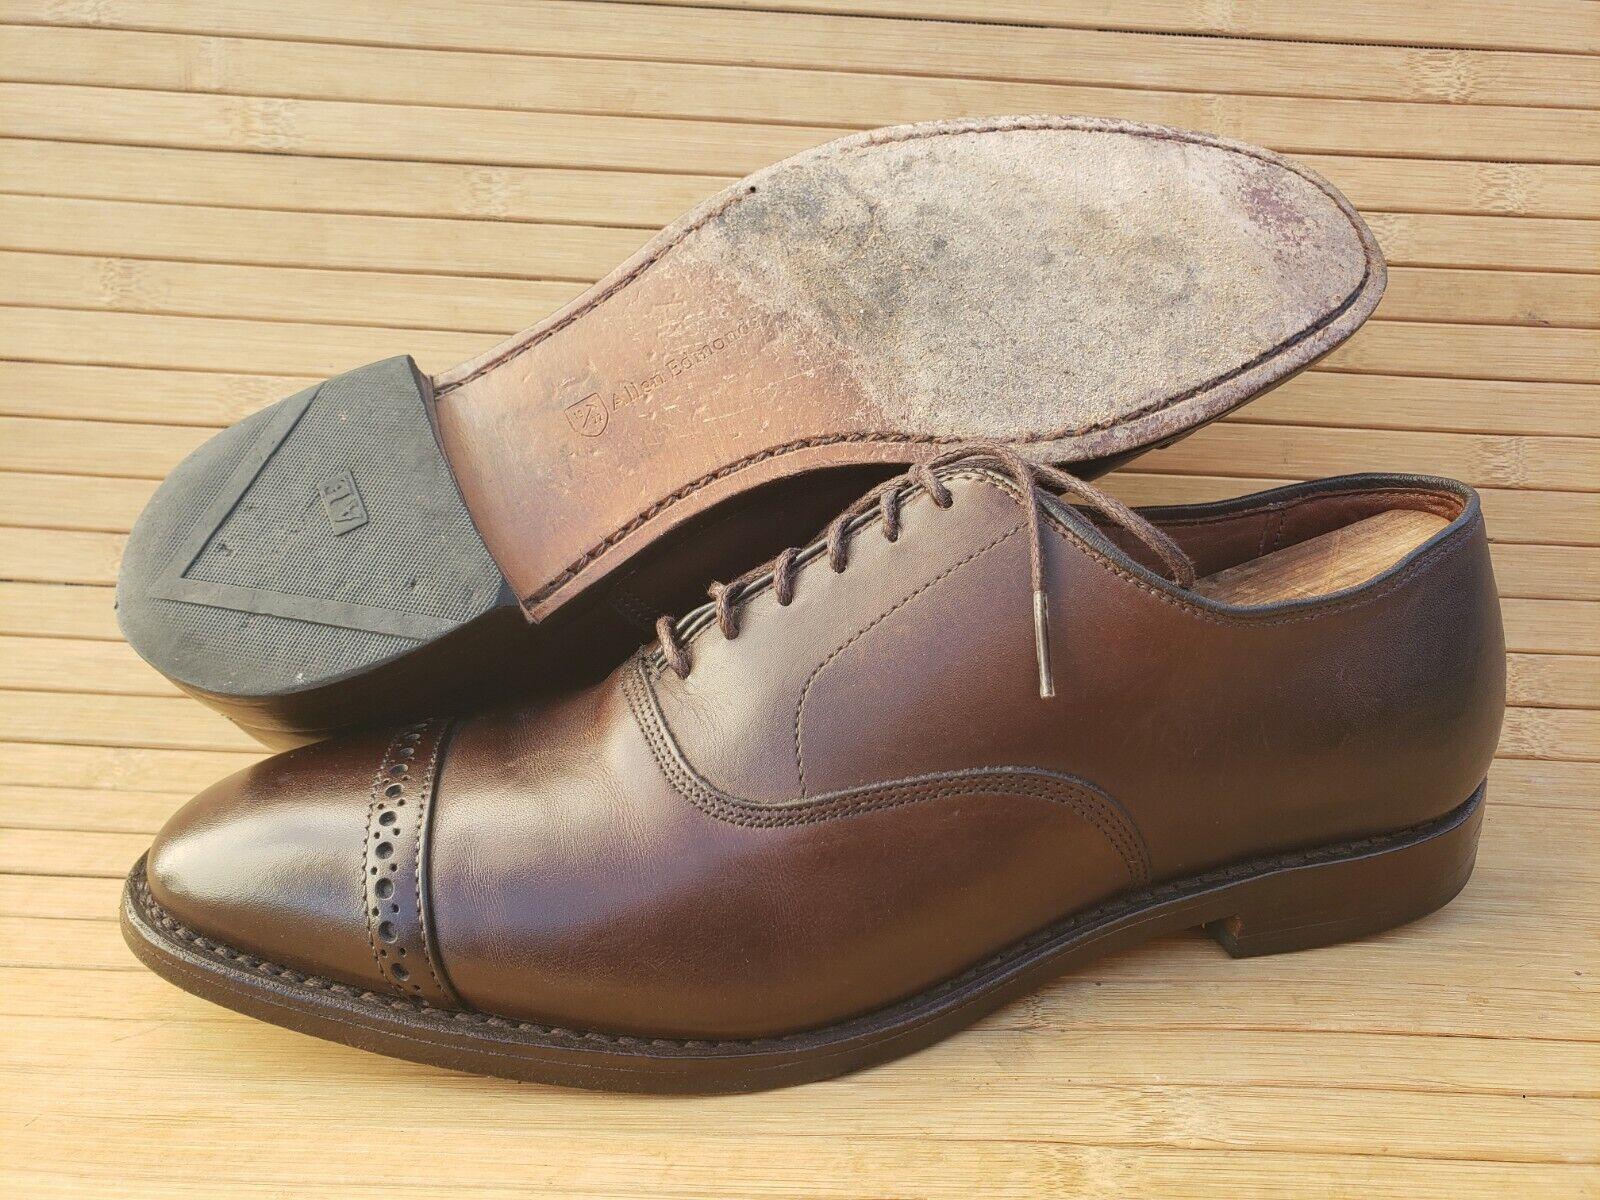 Cap Toe Dress Shoe 10.5 3e (wide